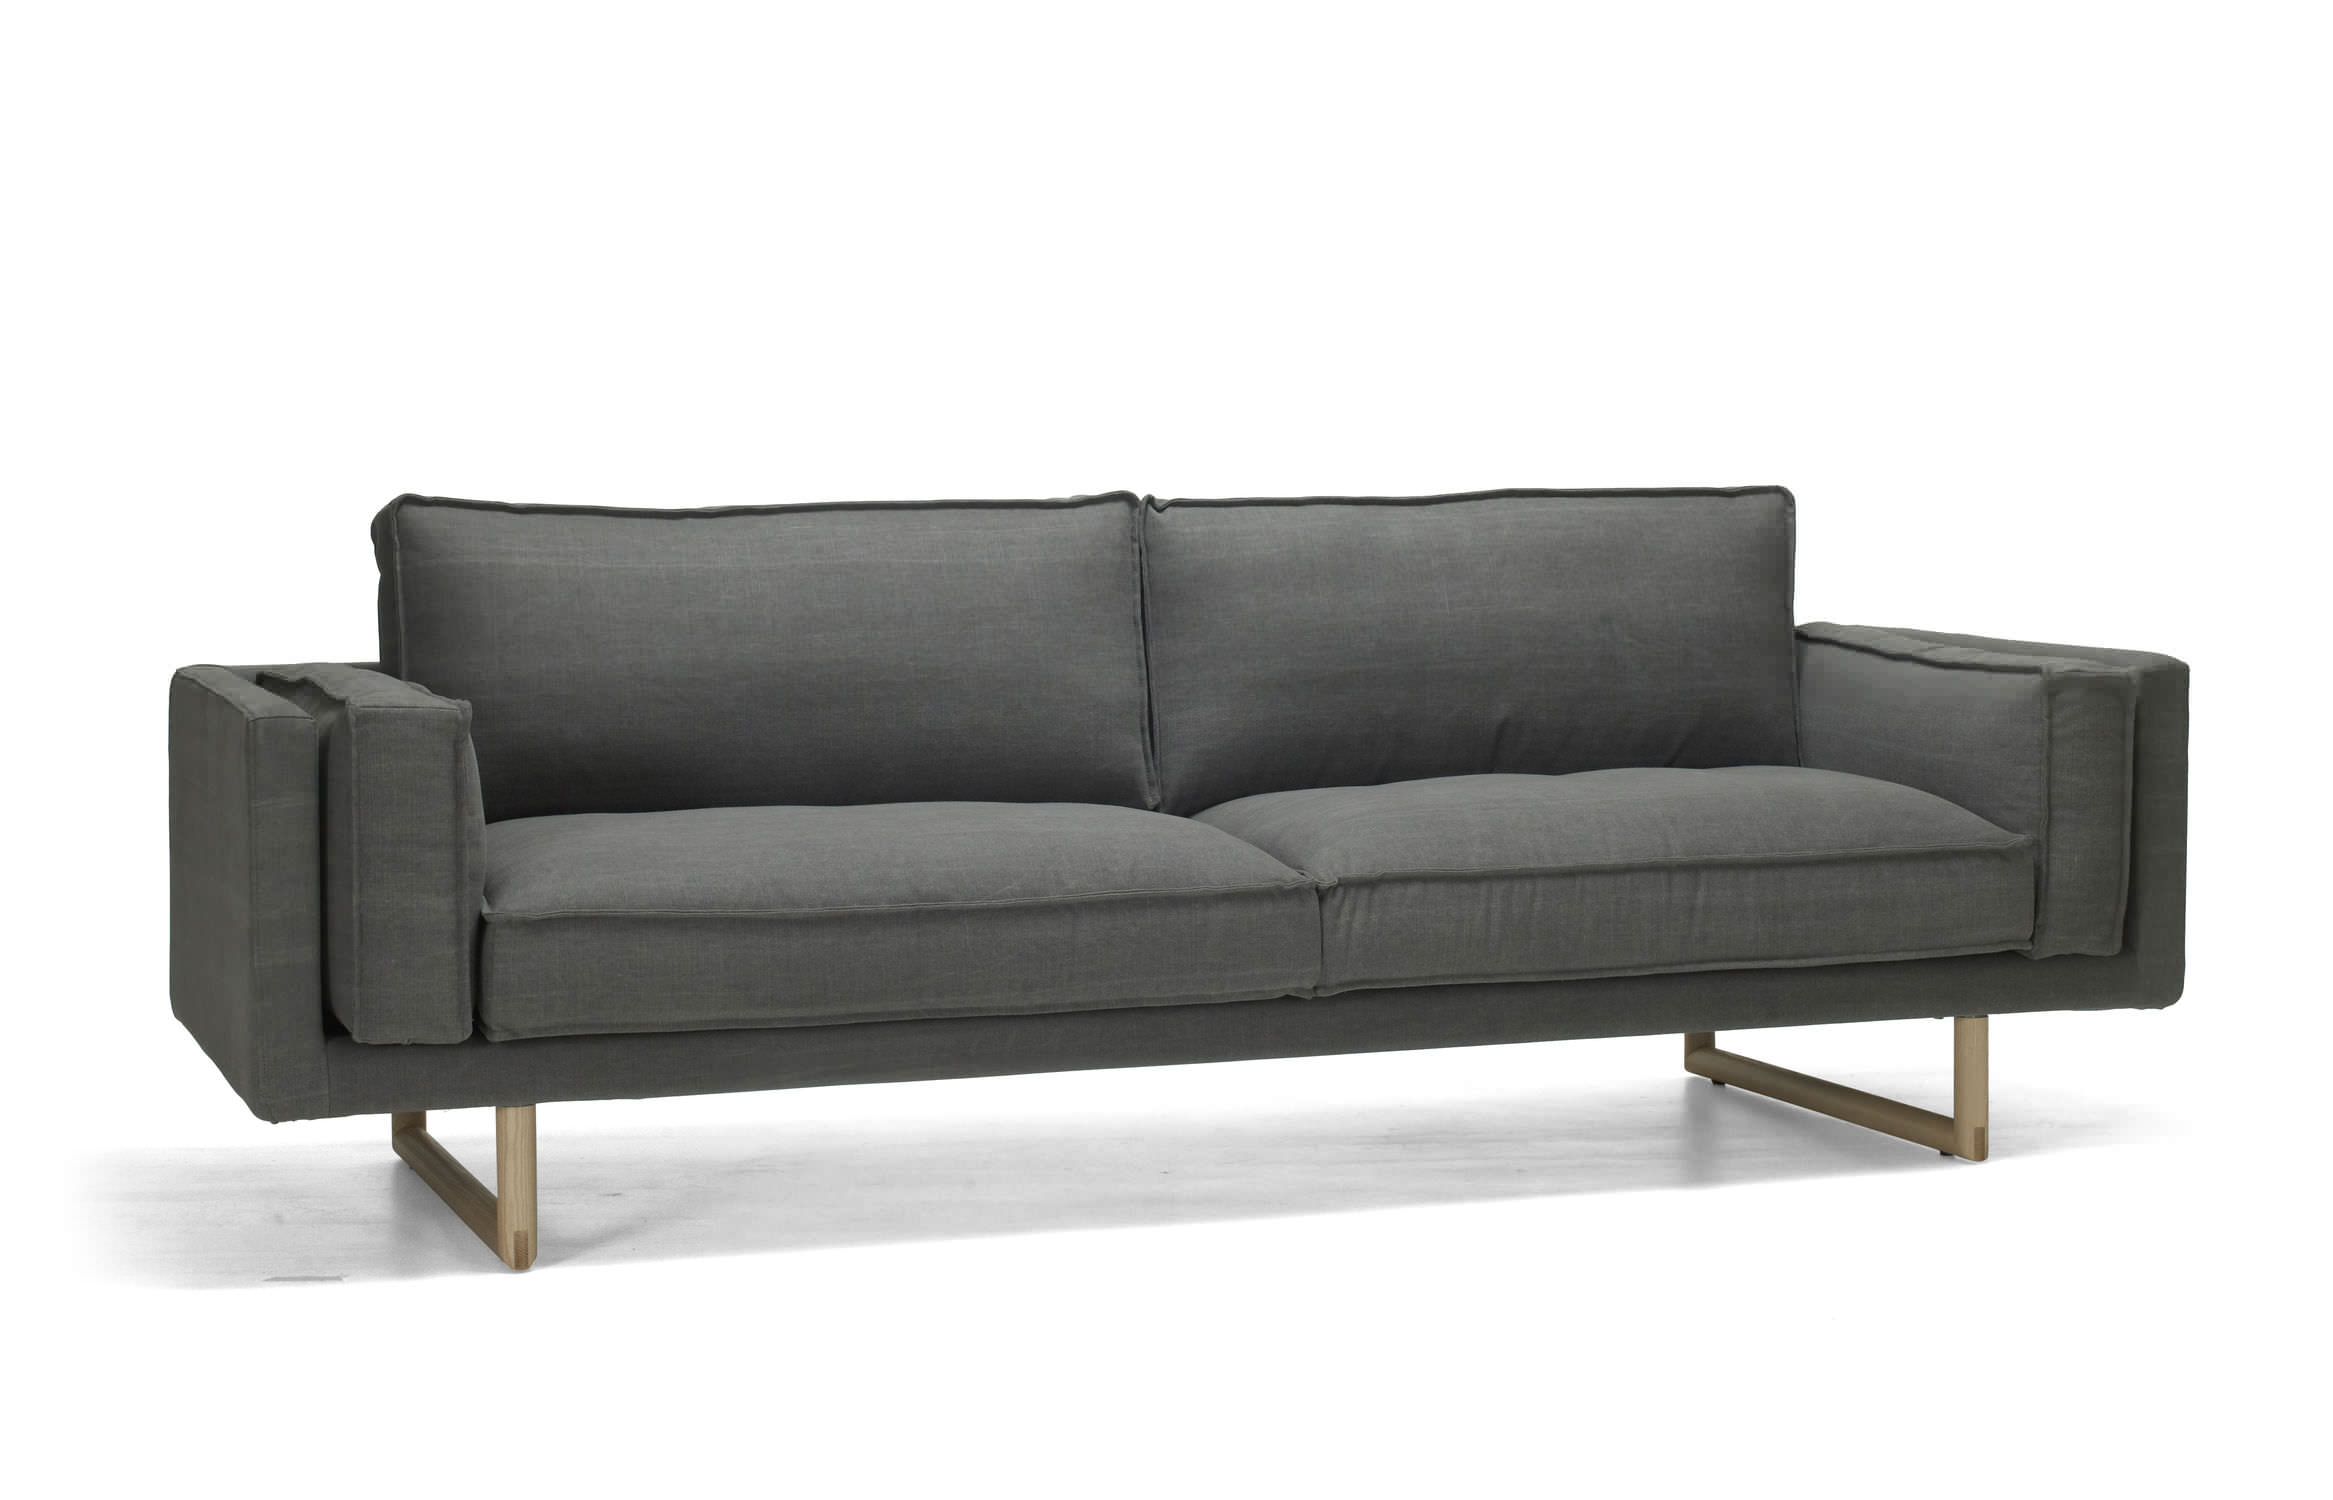 Modernes Sofa - ALTERO - Ire Möbel AB - Stoff / 3 Plätze ...